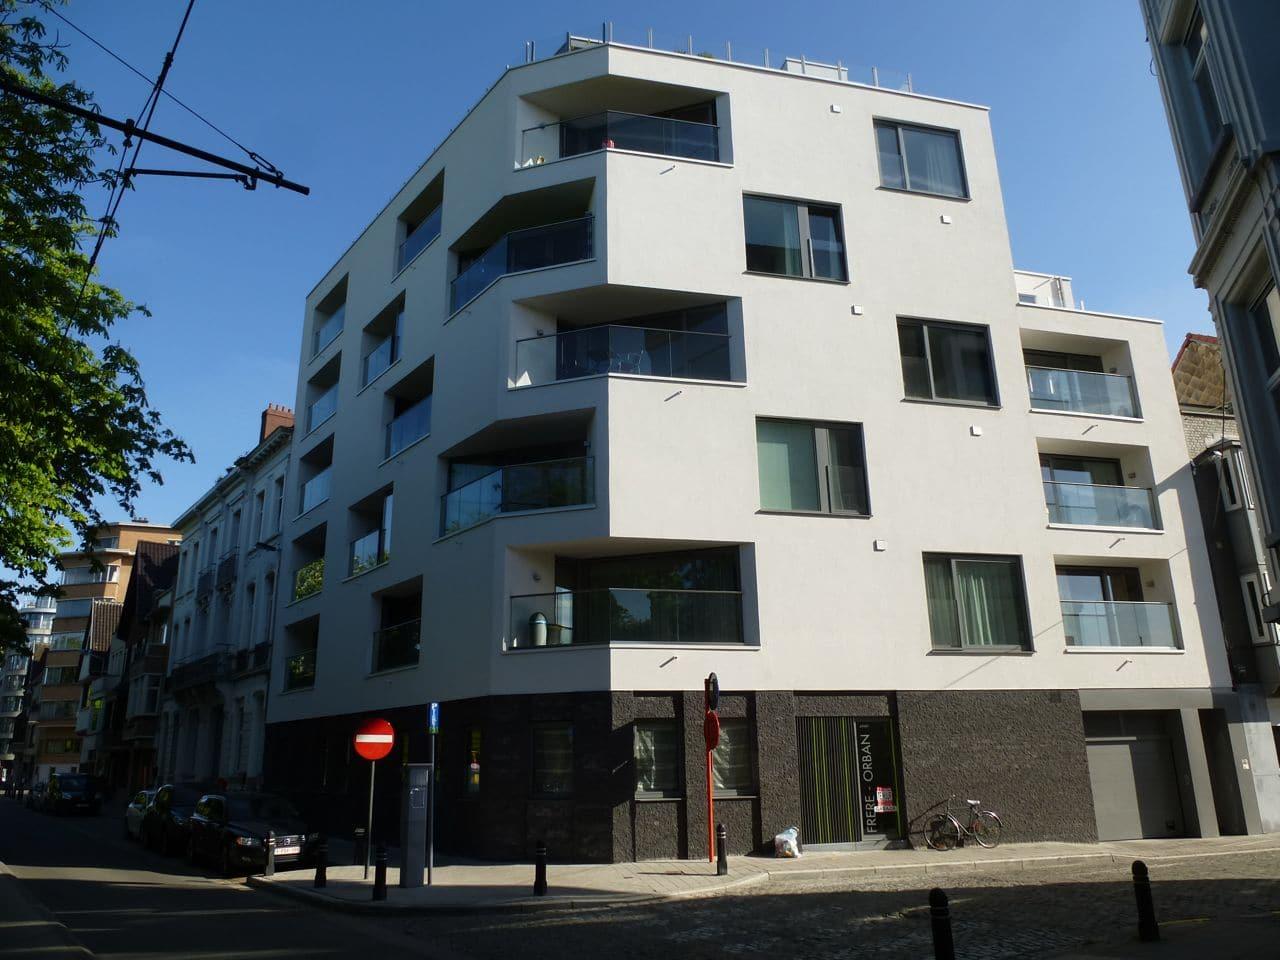 P1120408 | Baeyens & Beck architecten Gent | architect nieuwbouw renovatie interieur | high end | architectenbureau